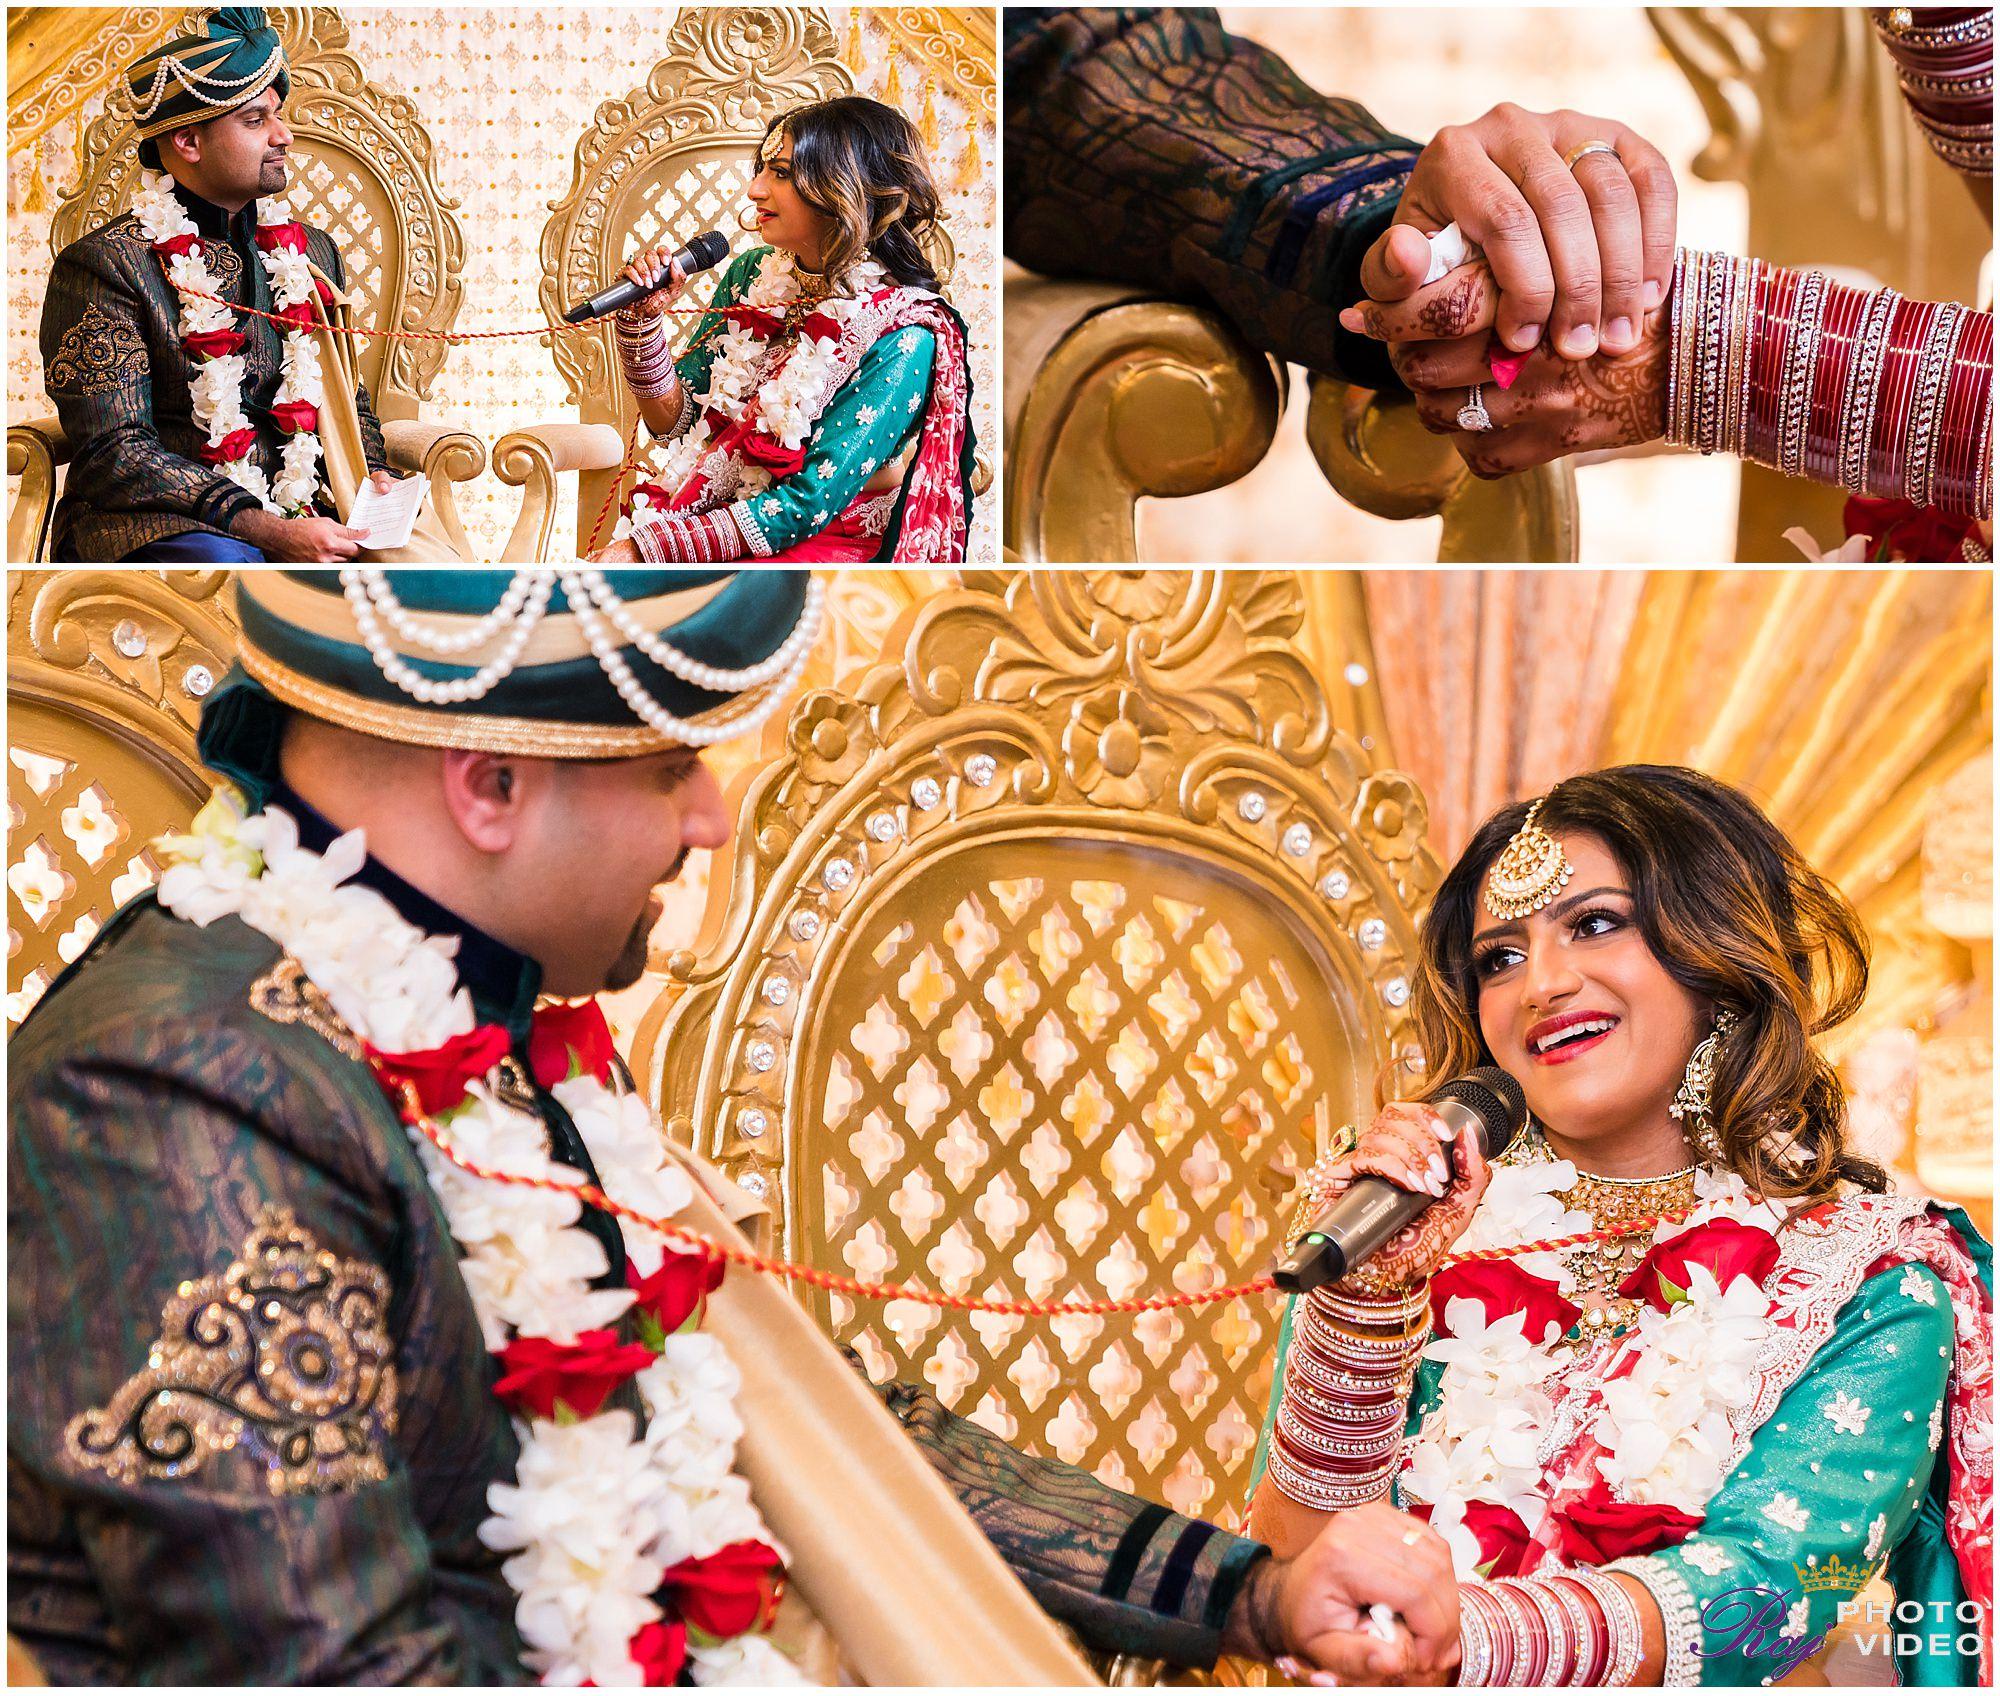 Sri-Guruvaayoorappan-Temple-Marlboro-NJ-Indian-Wedding-Chiyomi-Scott-00027.jpg